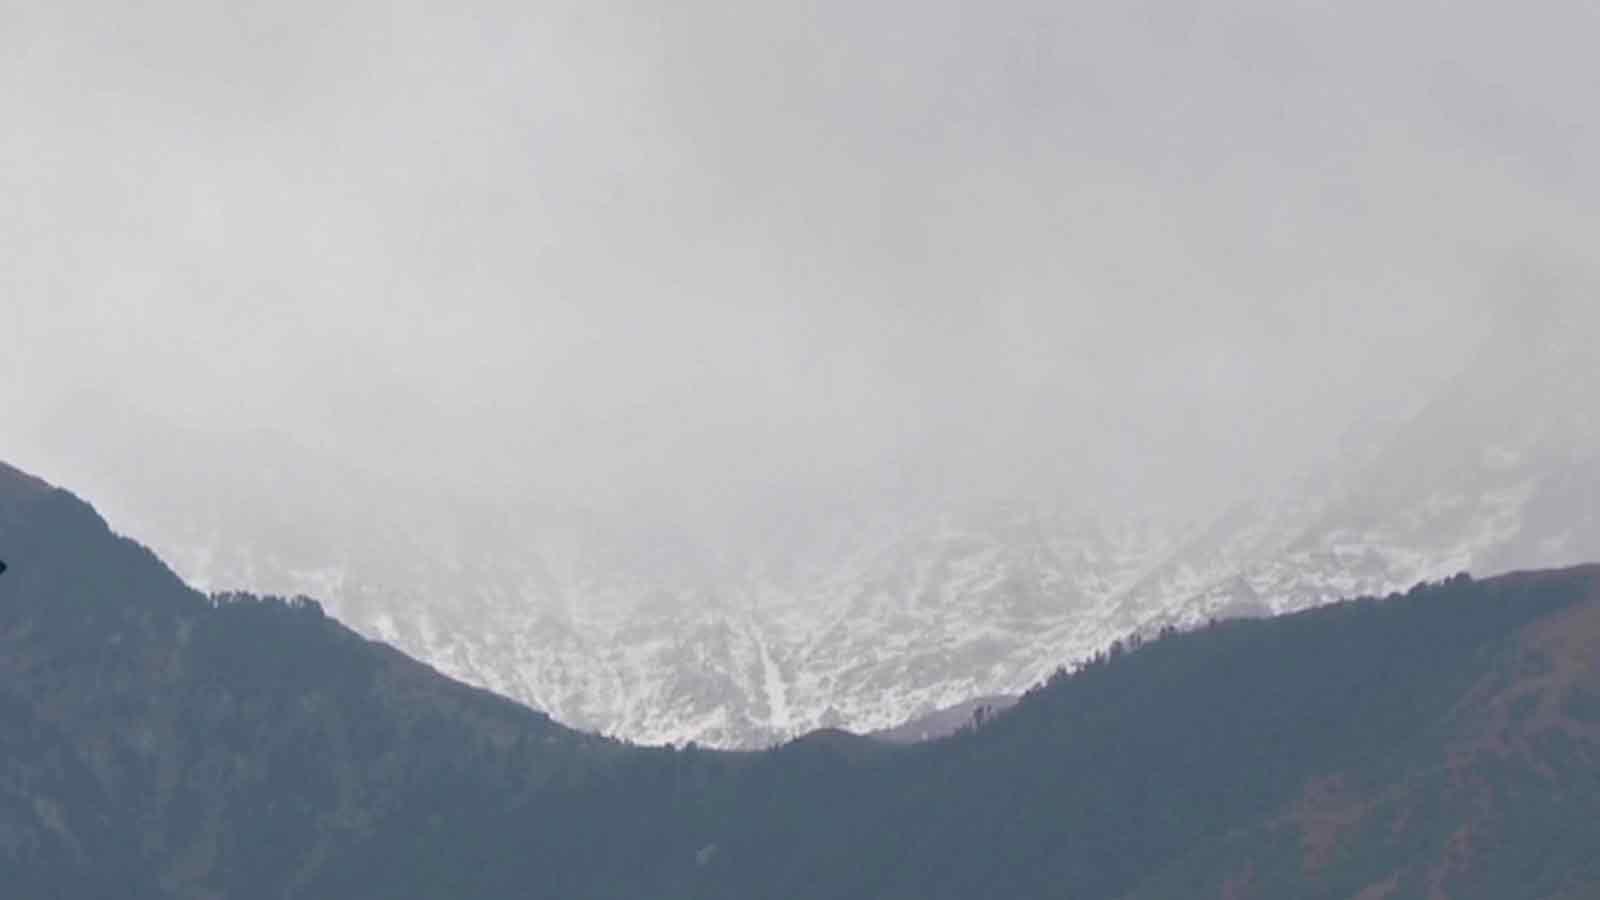 cold-wave-intensifies-in-himachal-pradesh-after-fresh-snowfall